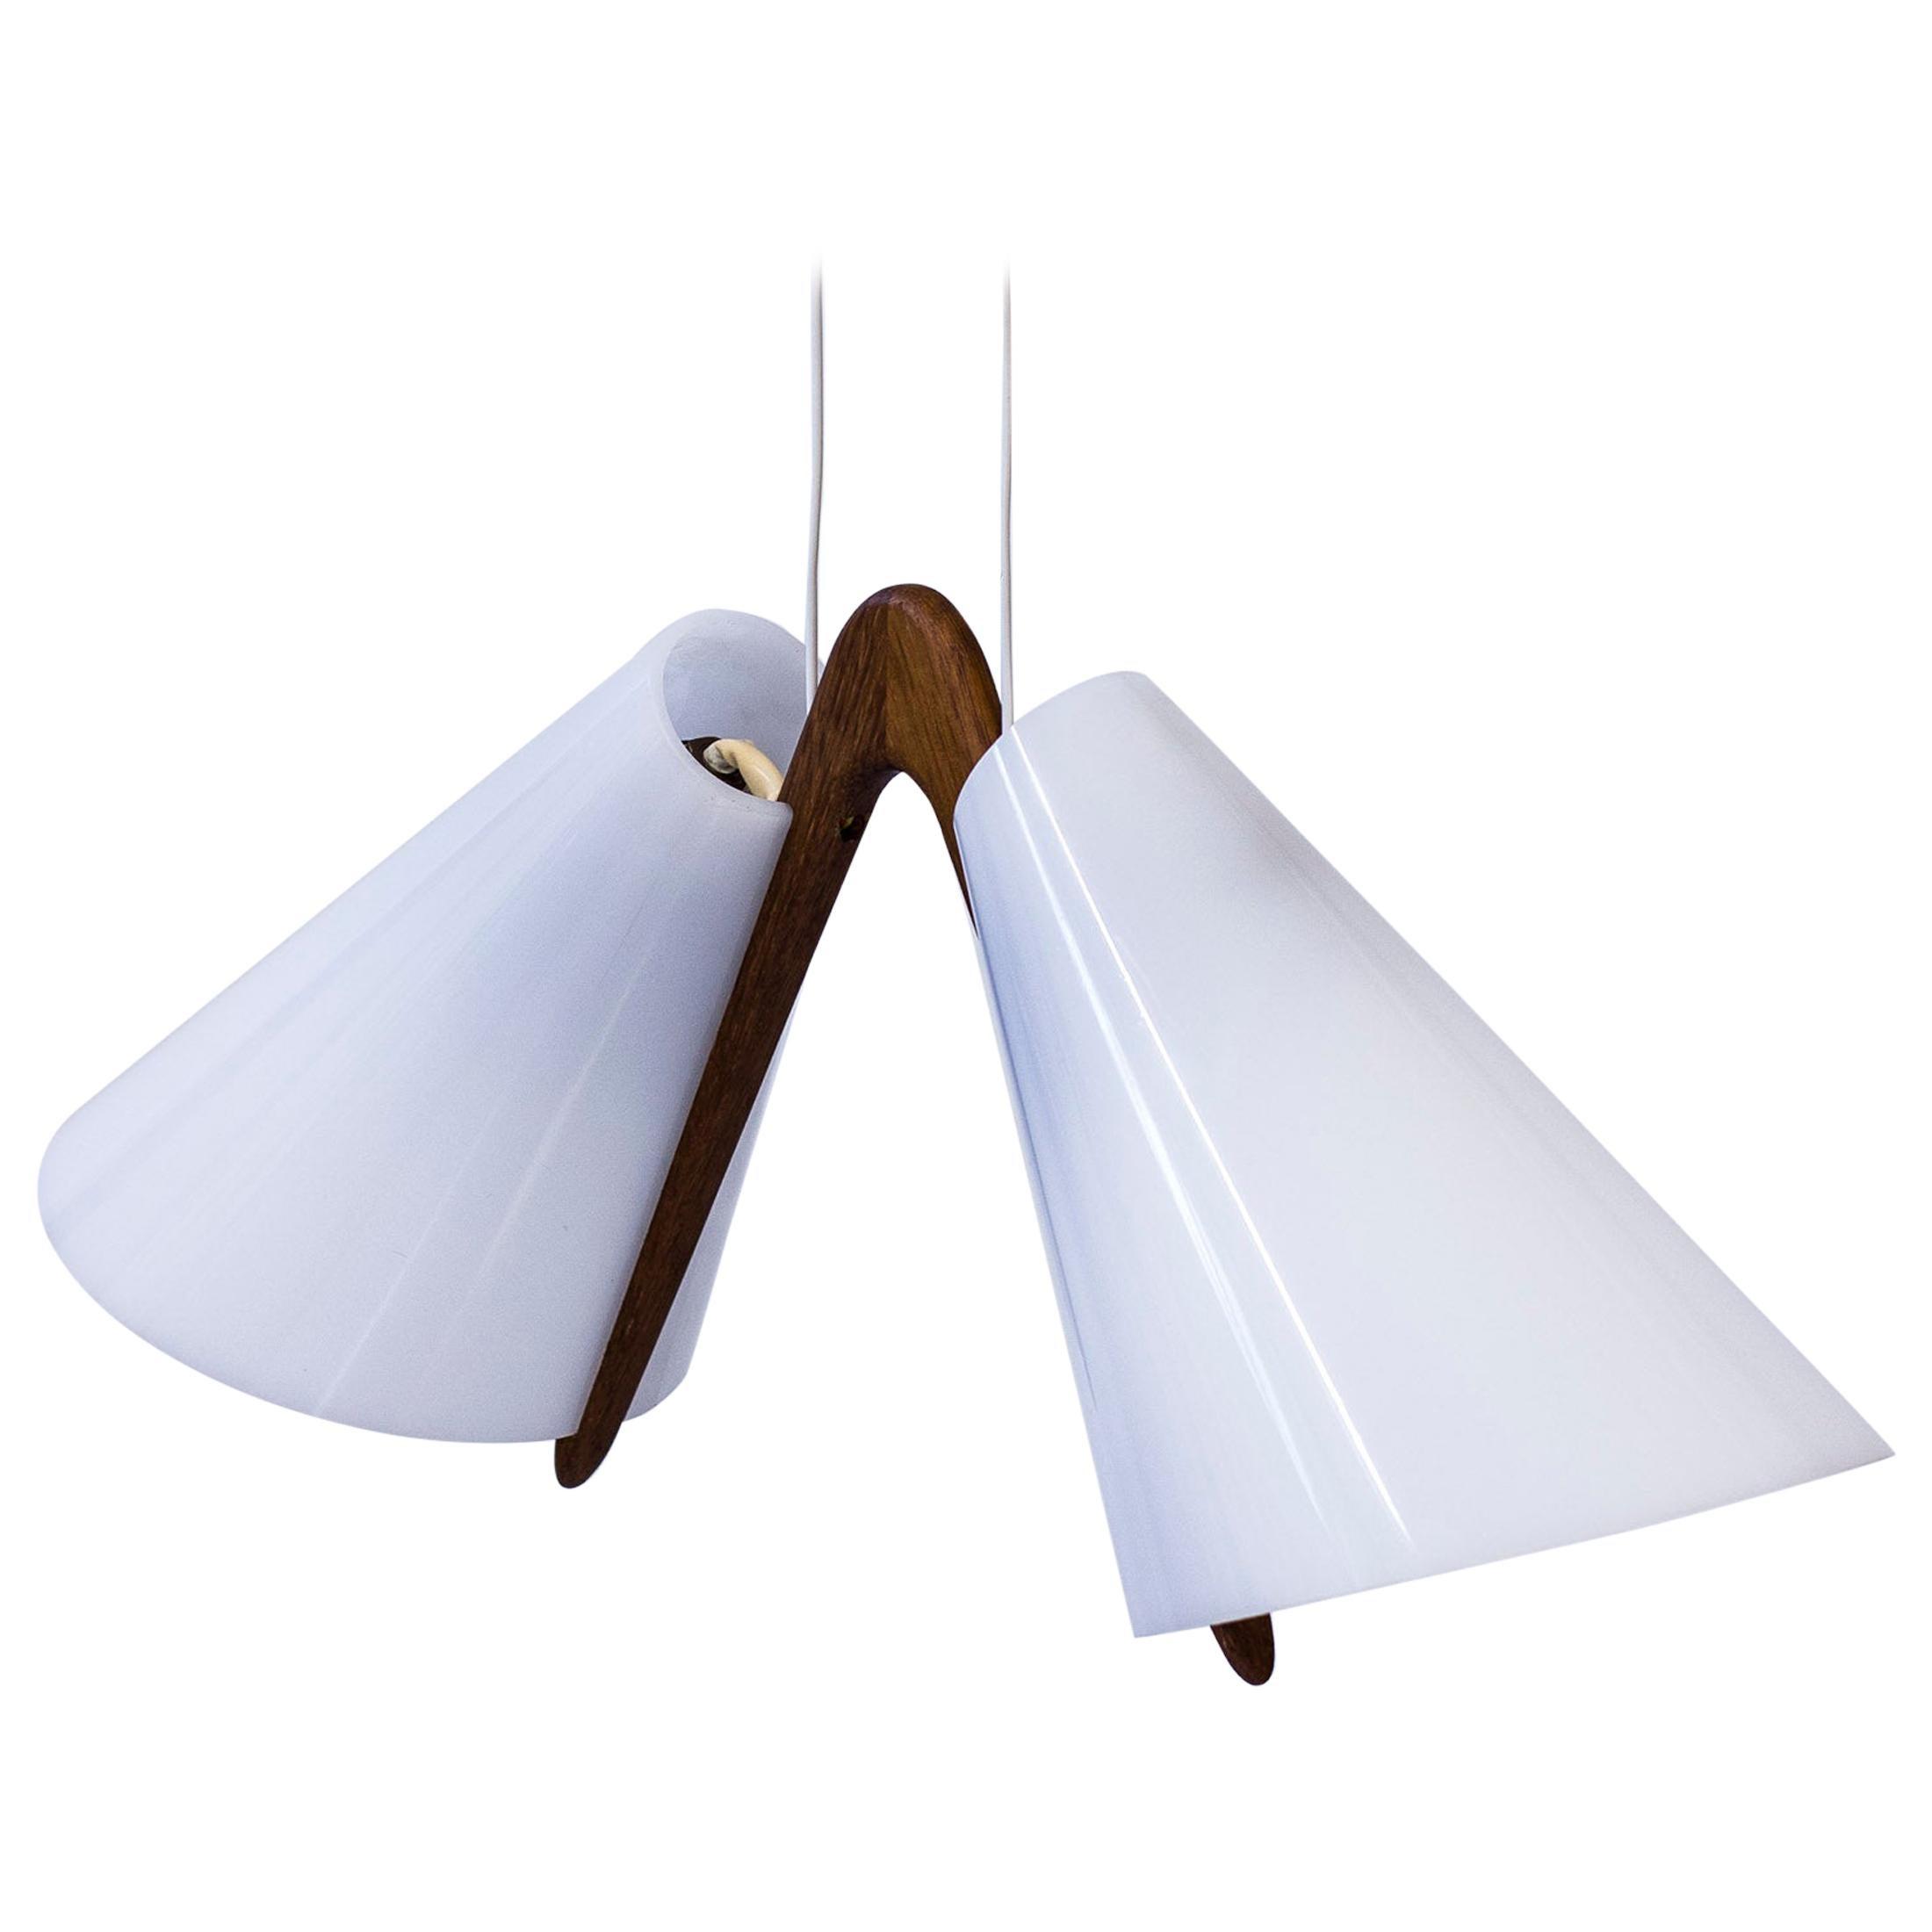 Pendant Light by Uno & Östen Kristiansson, Luxus, Sweden, 1950s